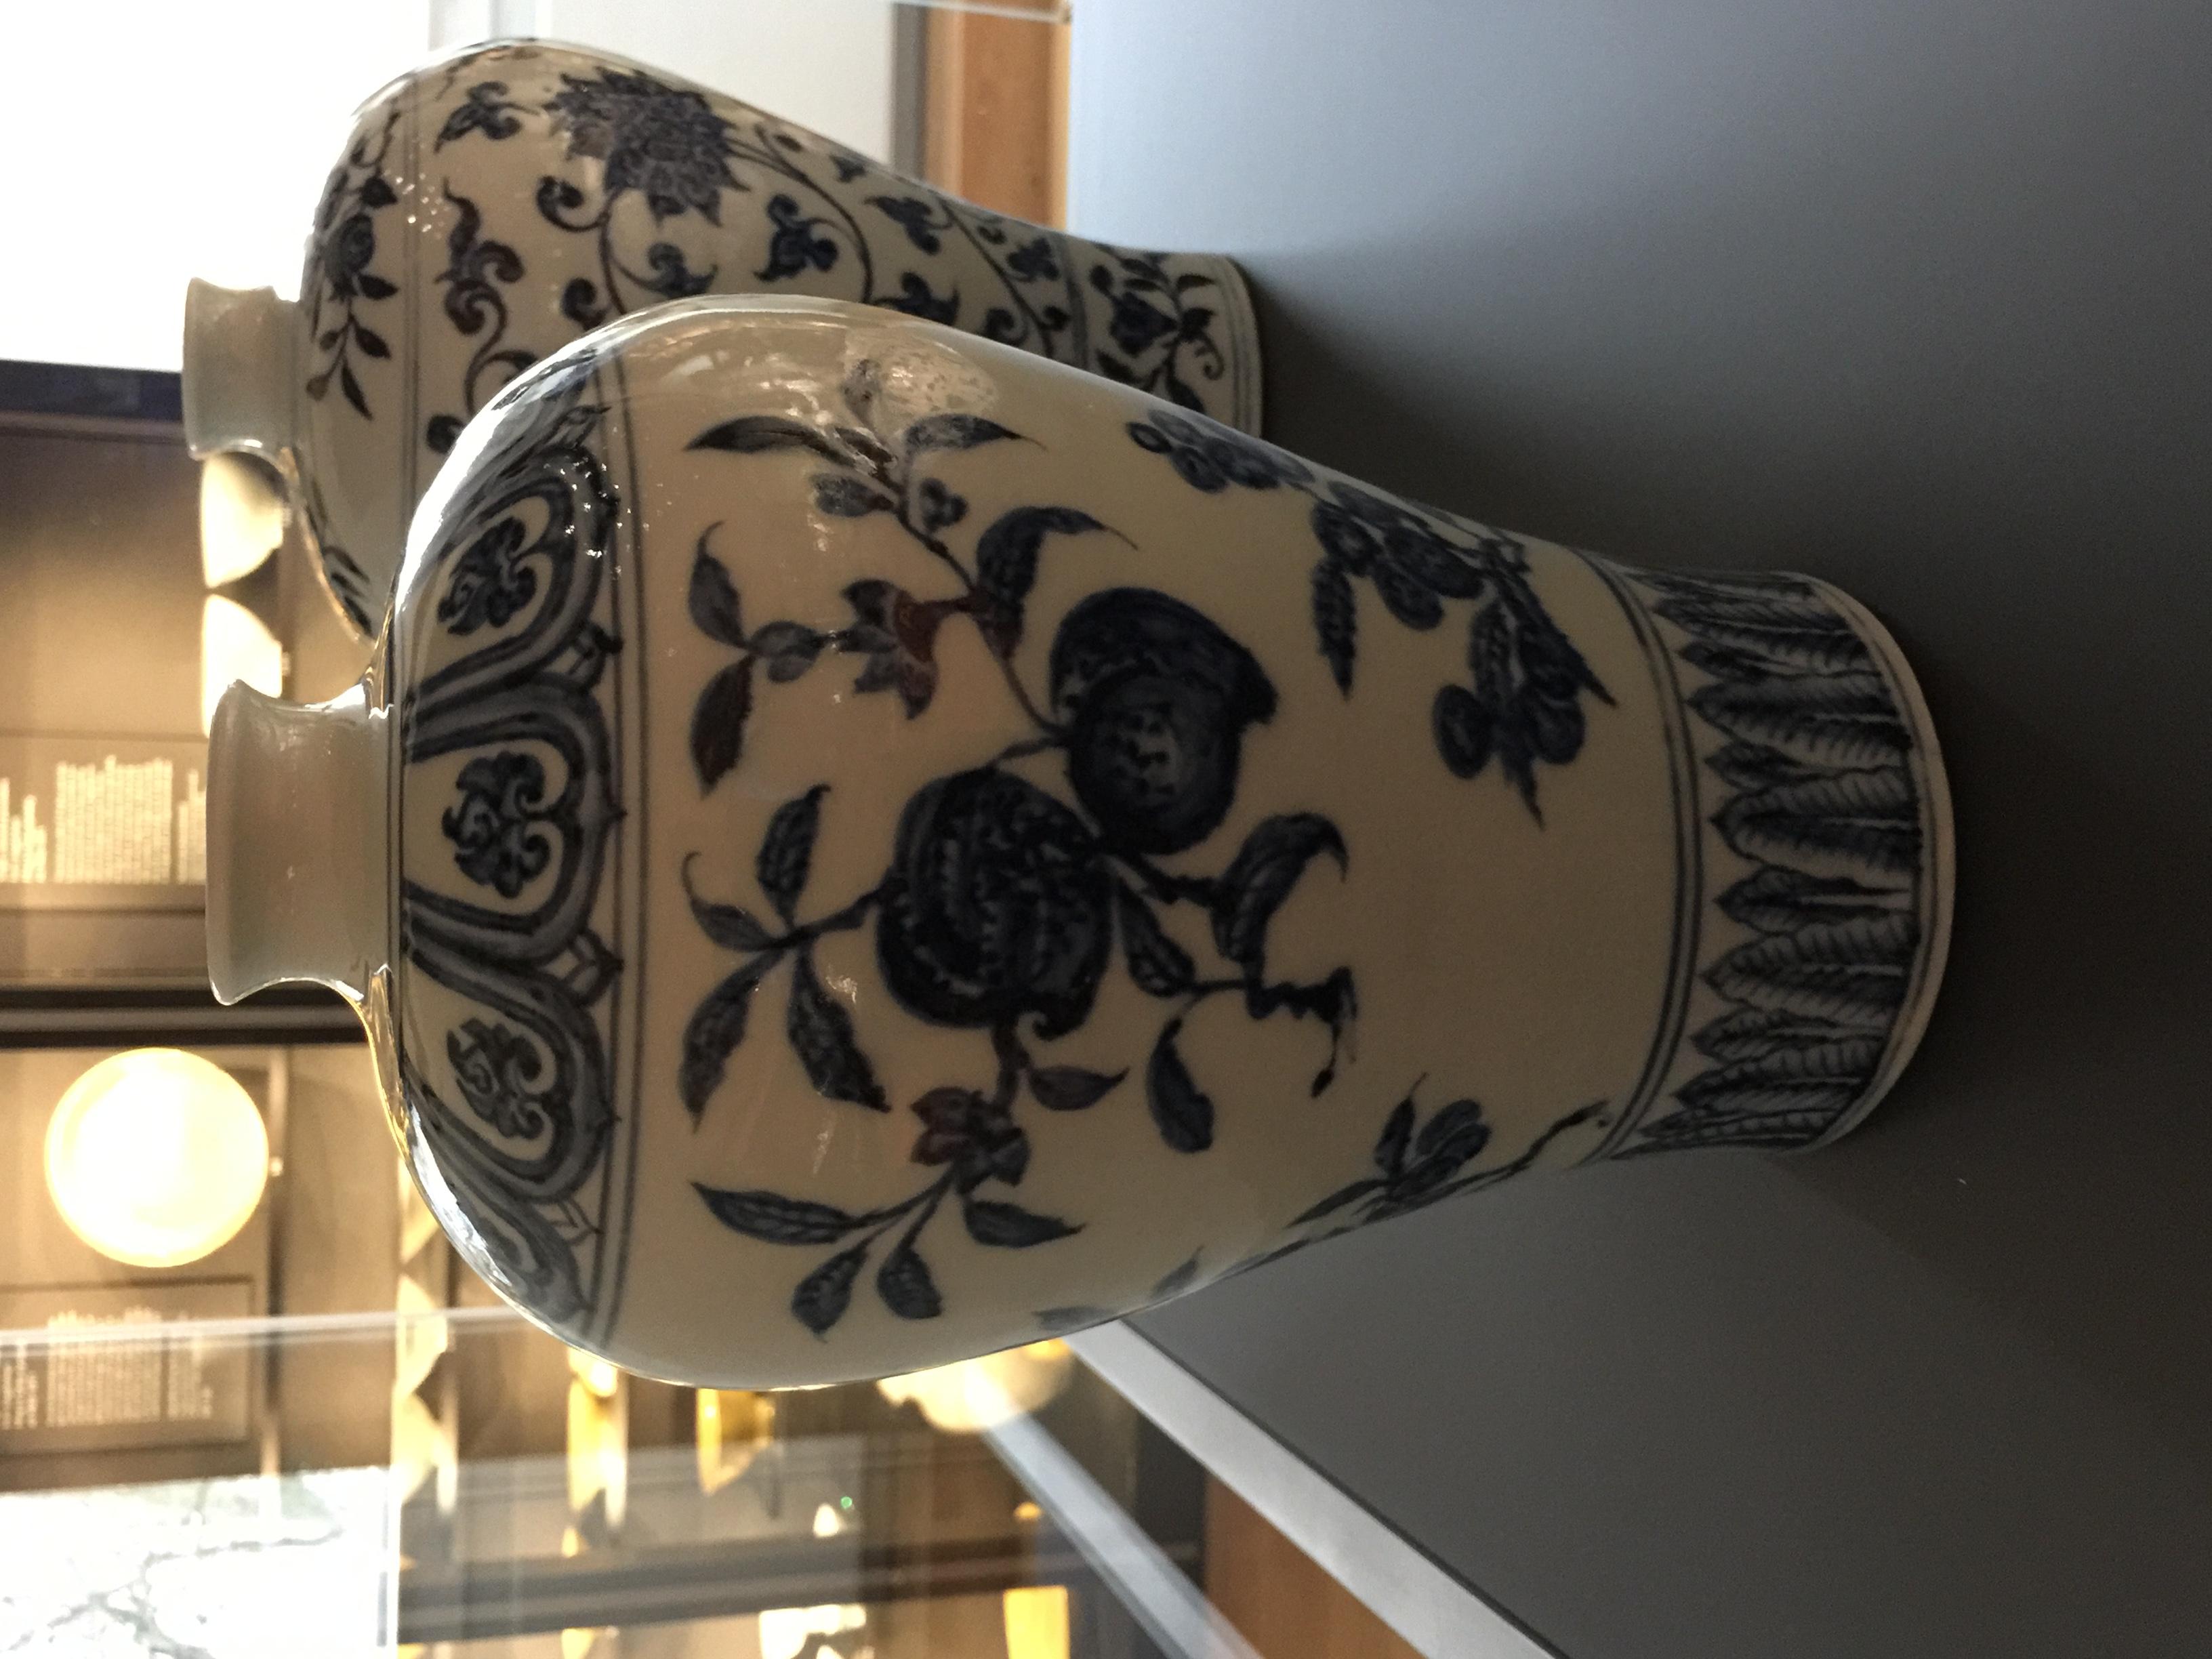 Chinese-Porcelain-British-Museum-Percival-David-jessewaugh.com-69.jpg